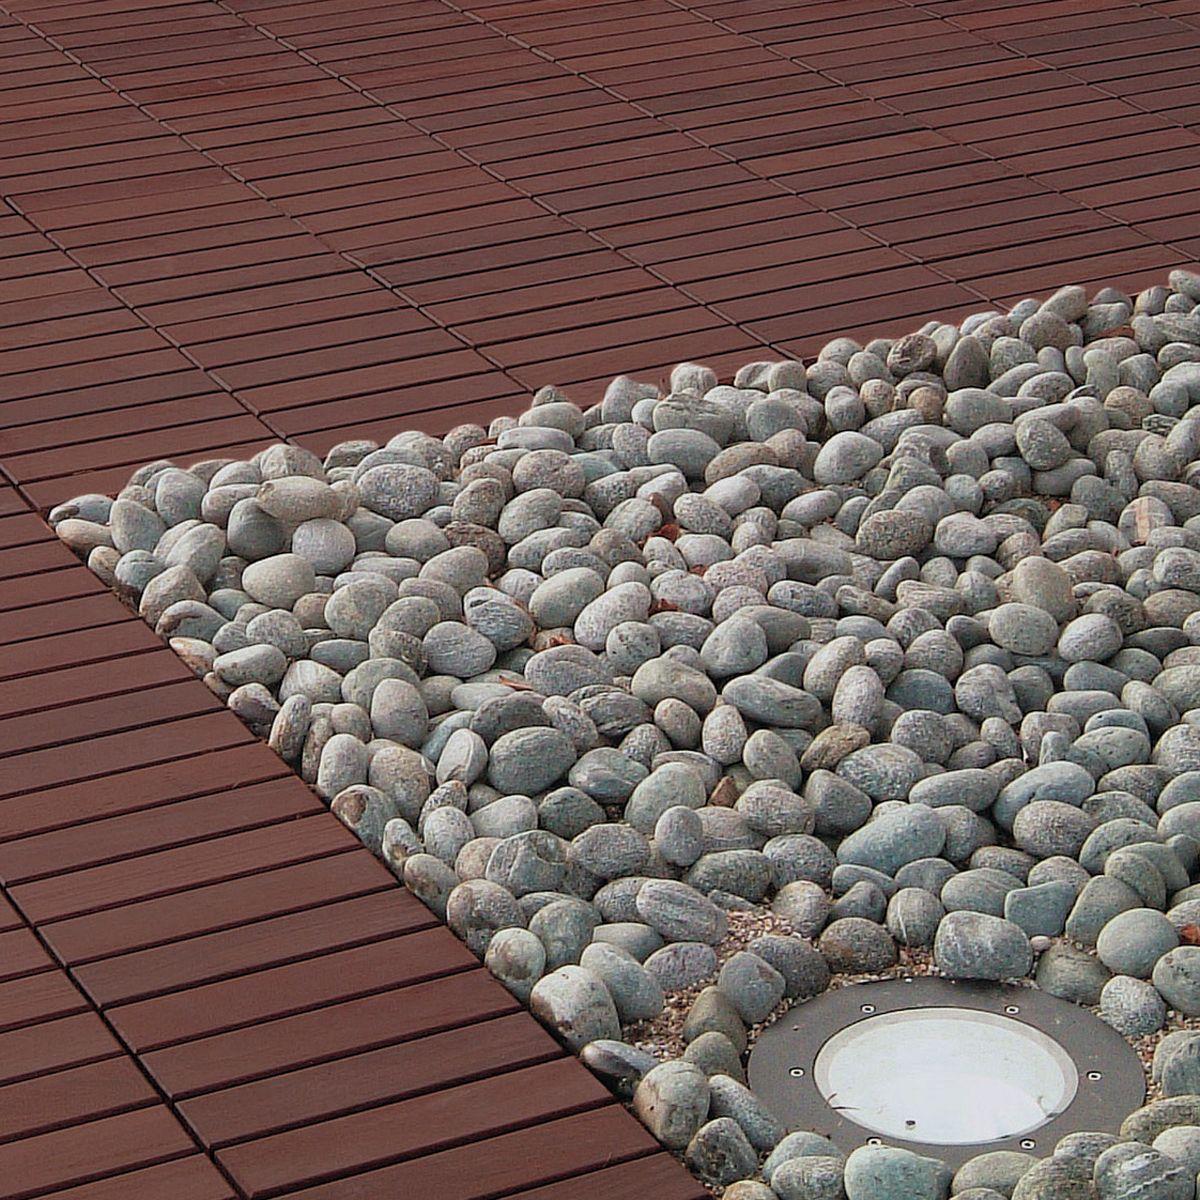 Pavimenti per giardini prezzi giardino e x tanaro for Pavimento legno esterno leroy merlin